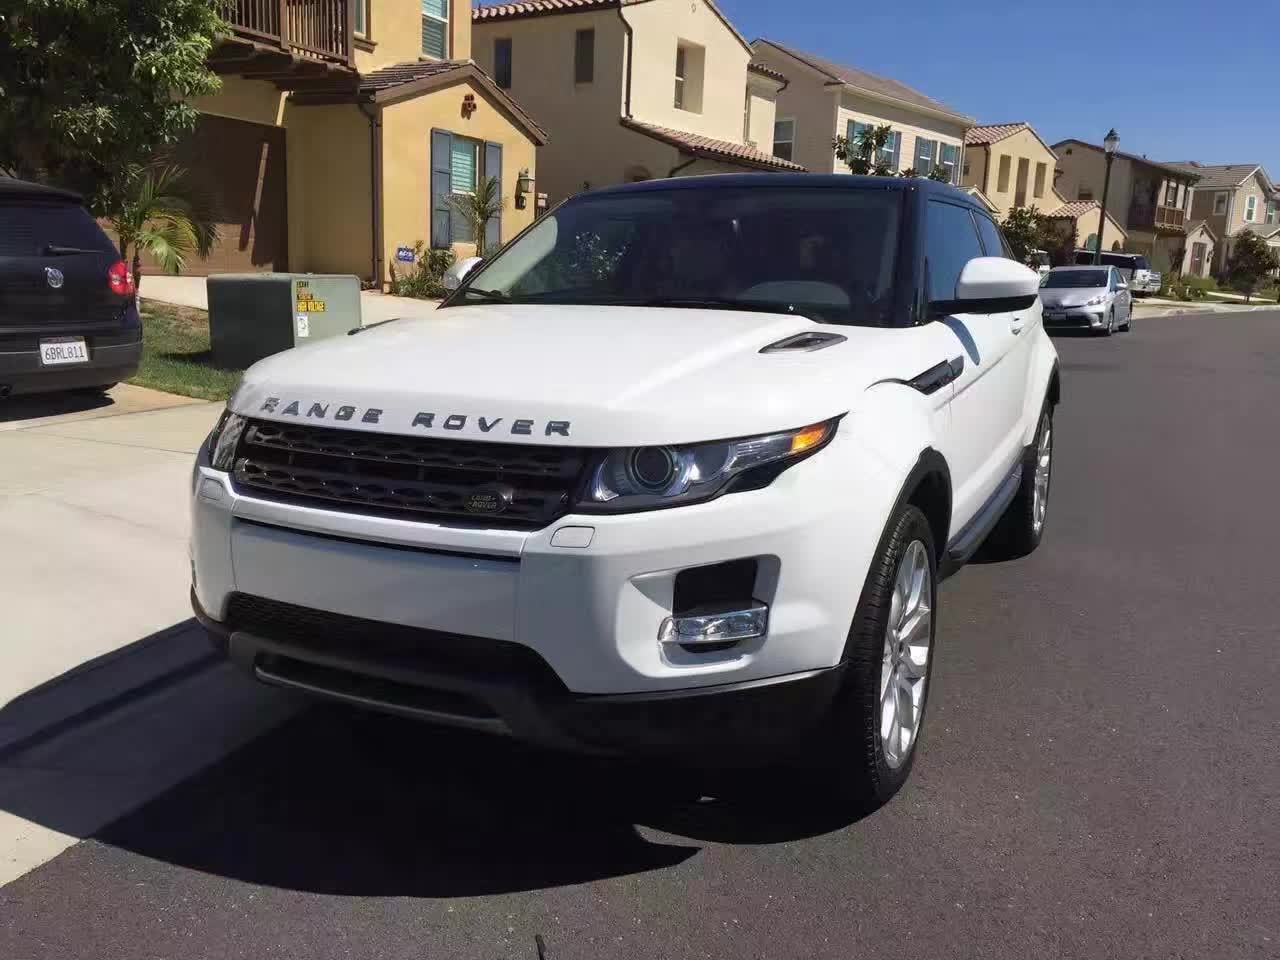 宾利 二手 ID Idaho 爱达荷州 博伊西 boisen Land Rover 路虎